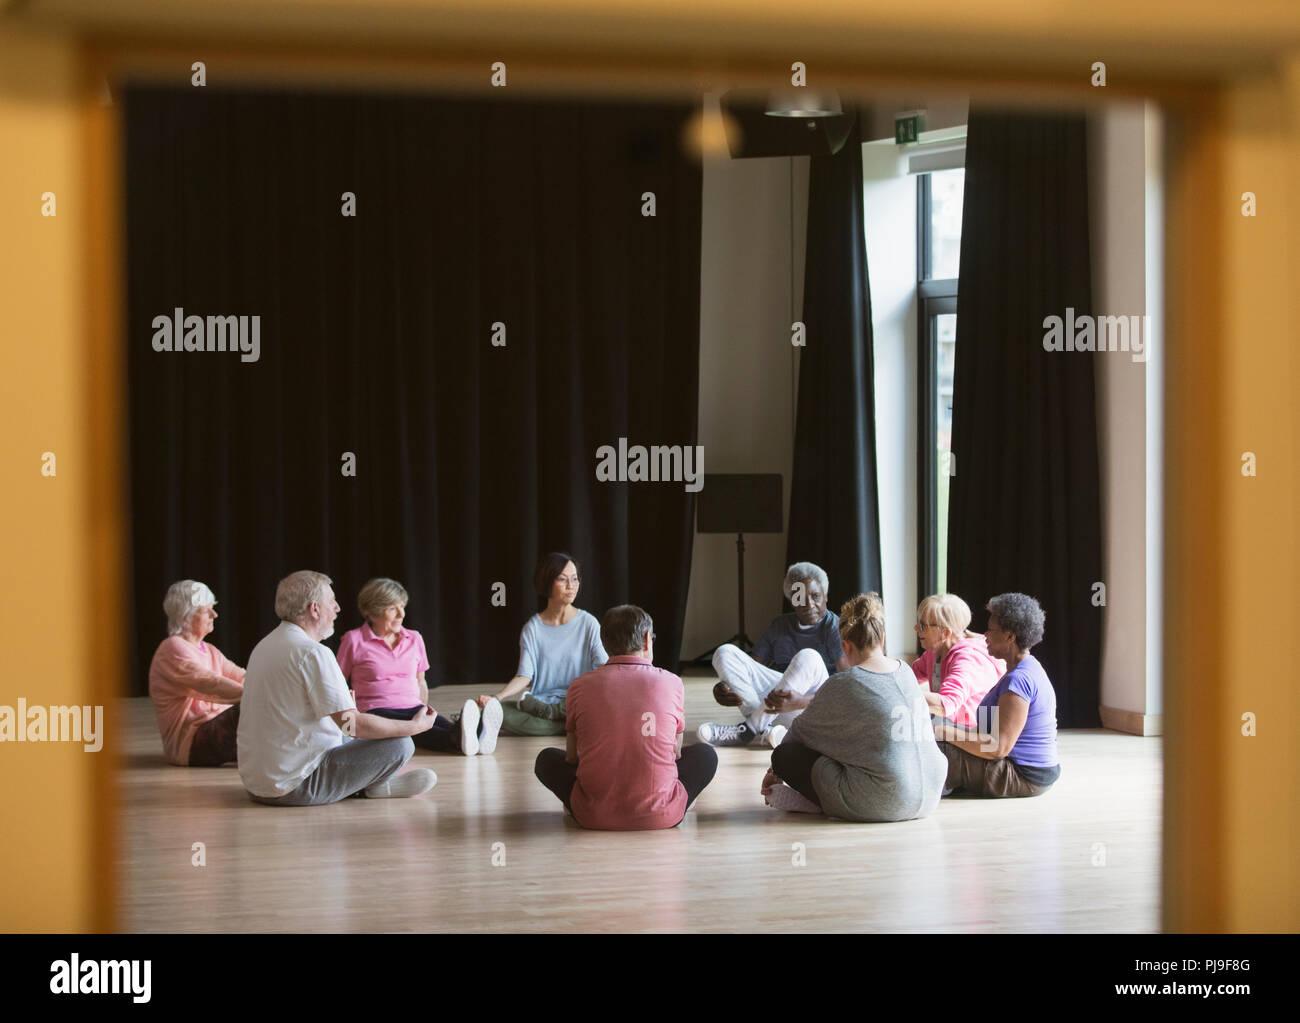 Active seniors meditating in circle - Stock Image